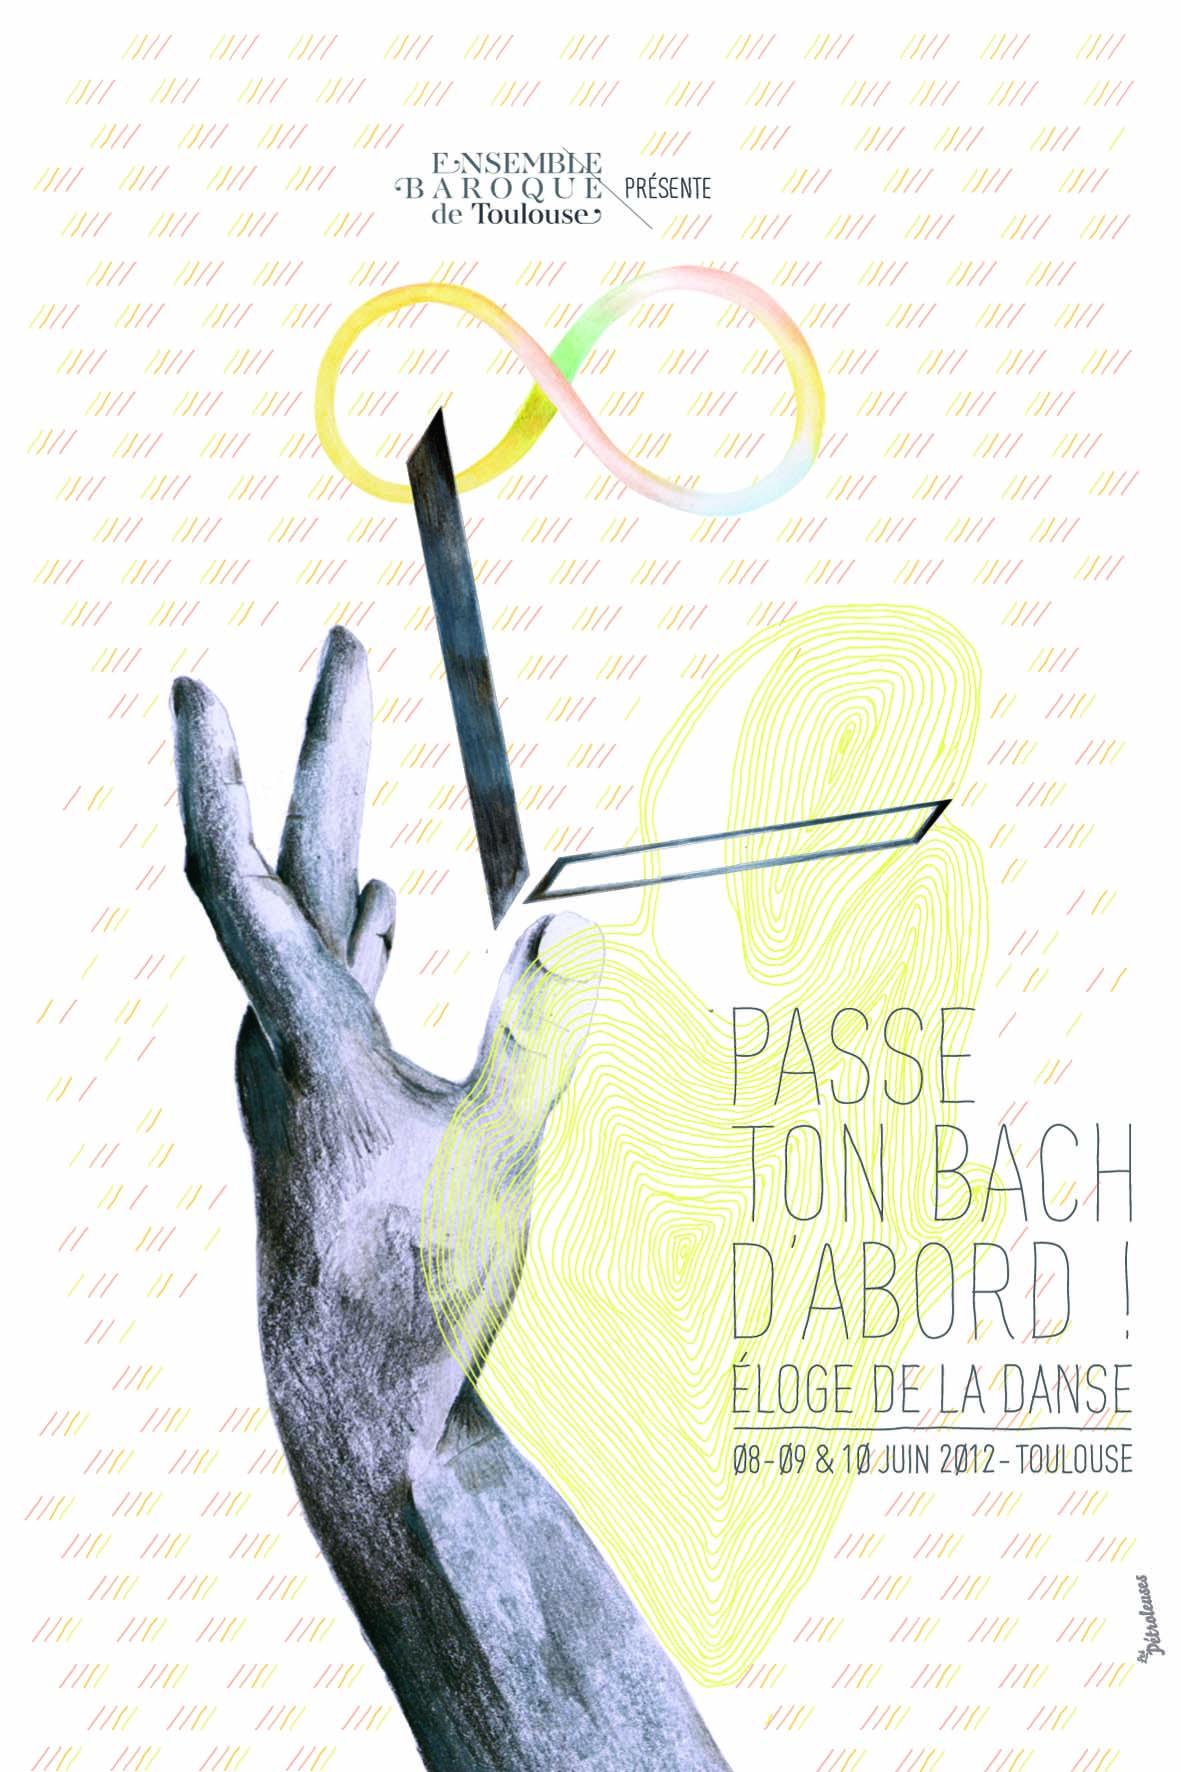 visuel-passetonbach2012-10x15cm.jpg